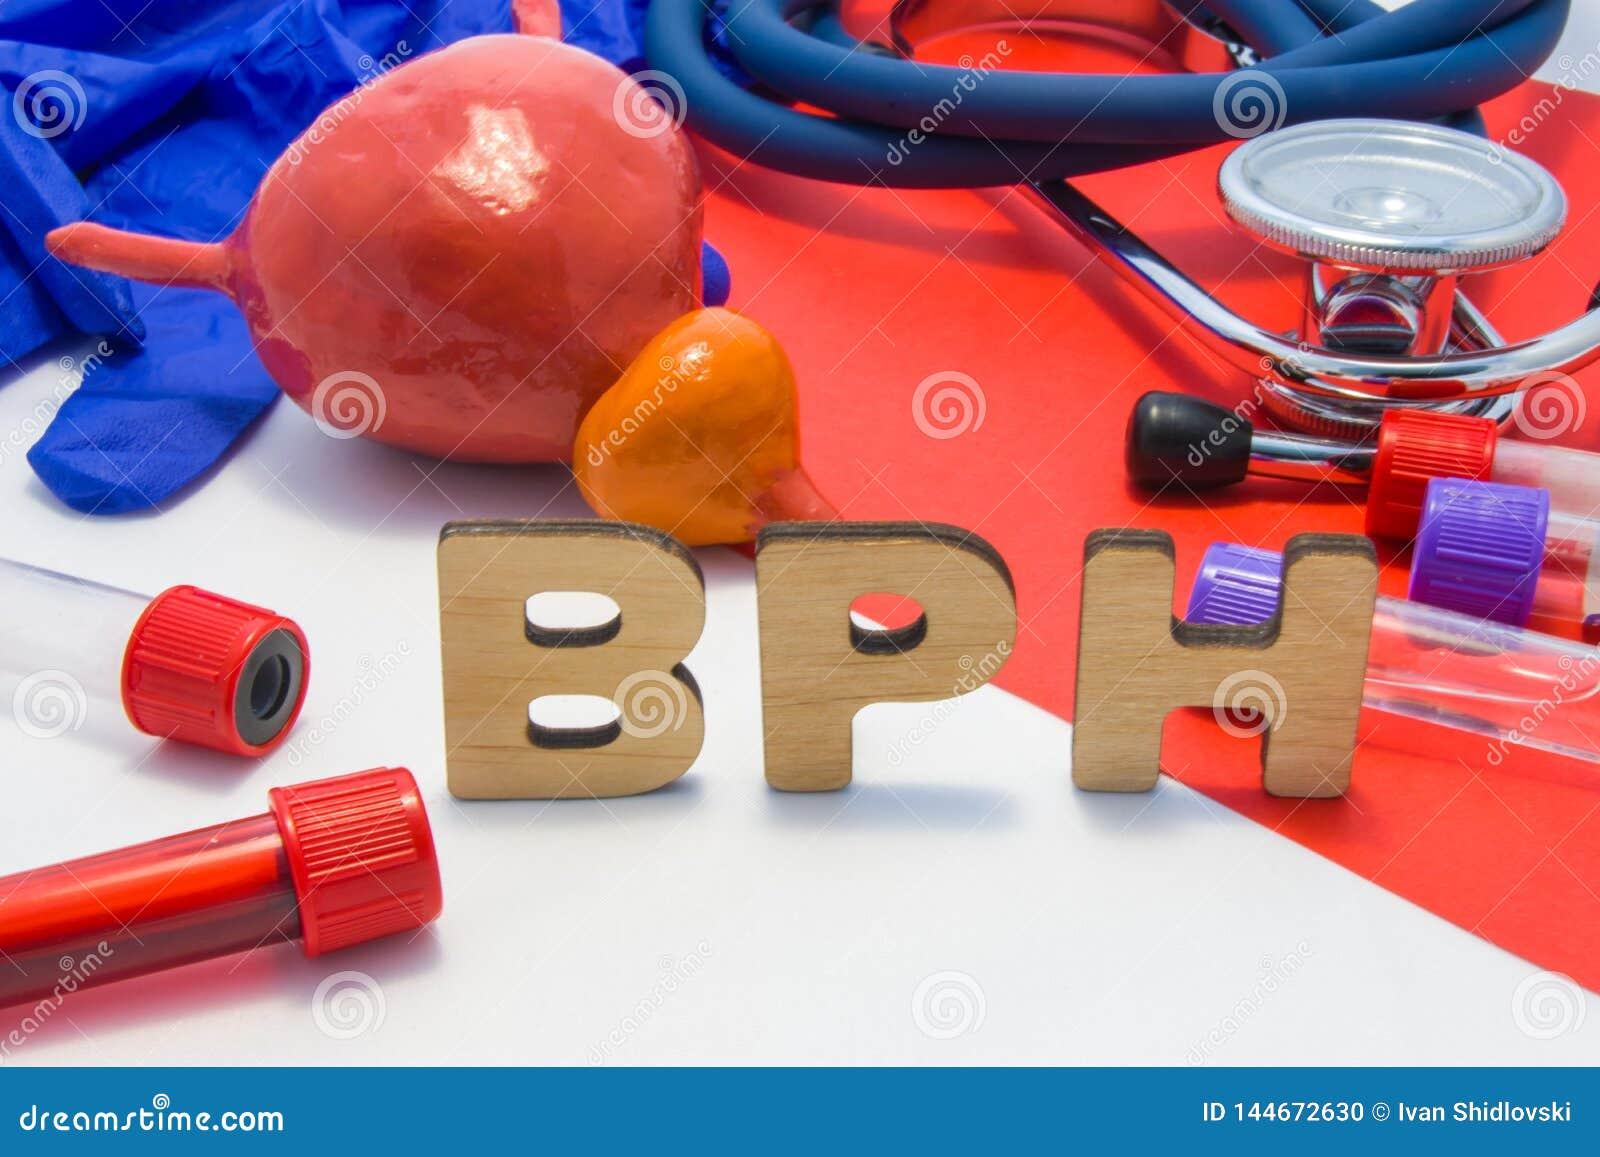 prostata bph